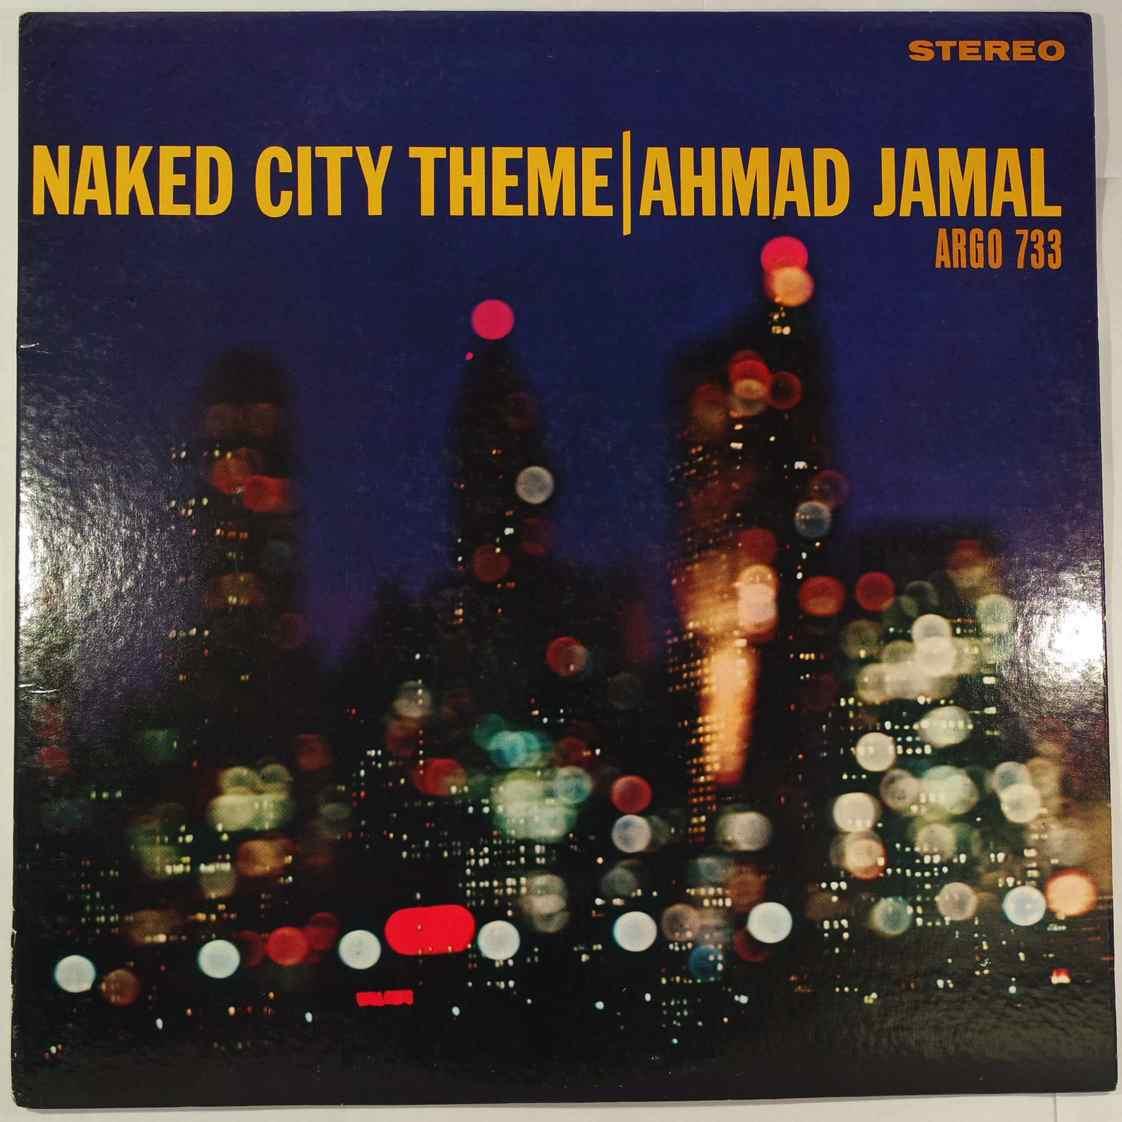 Ahmad Jamal Naked City Theme